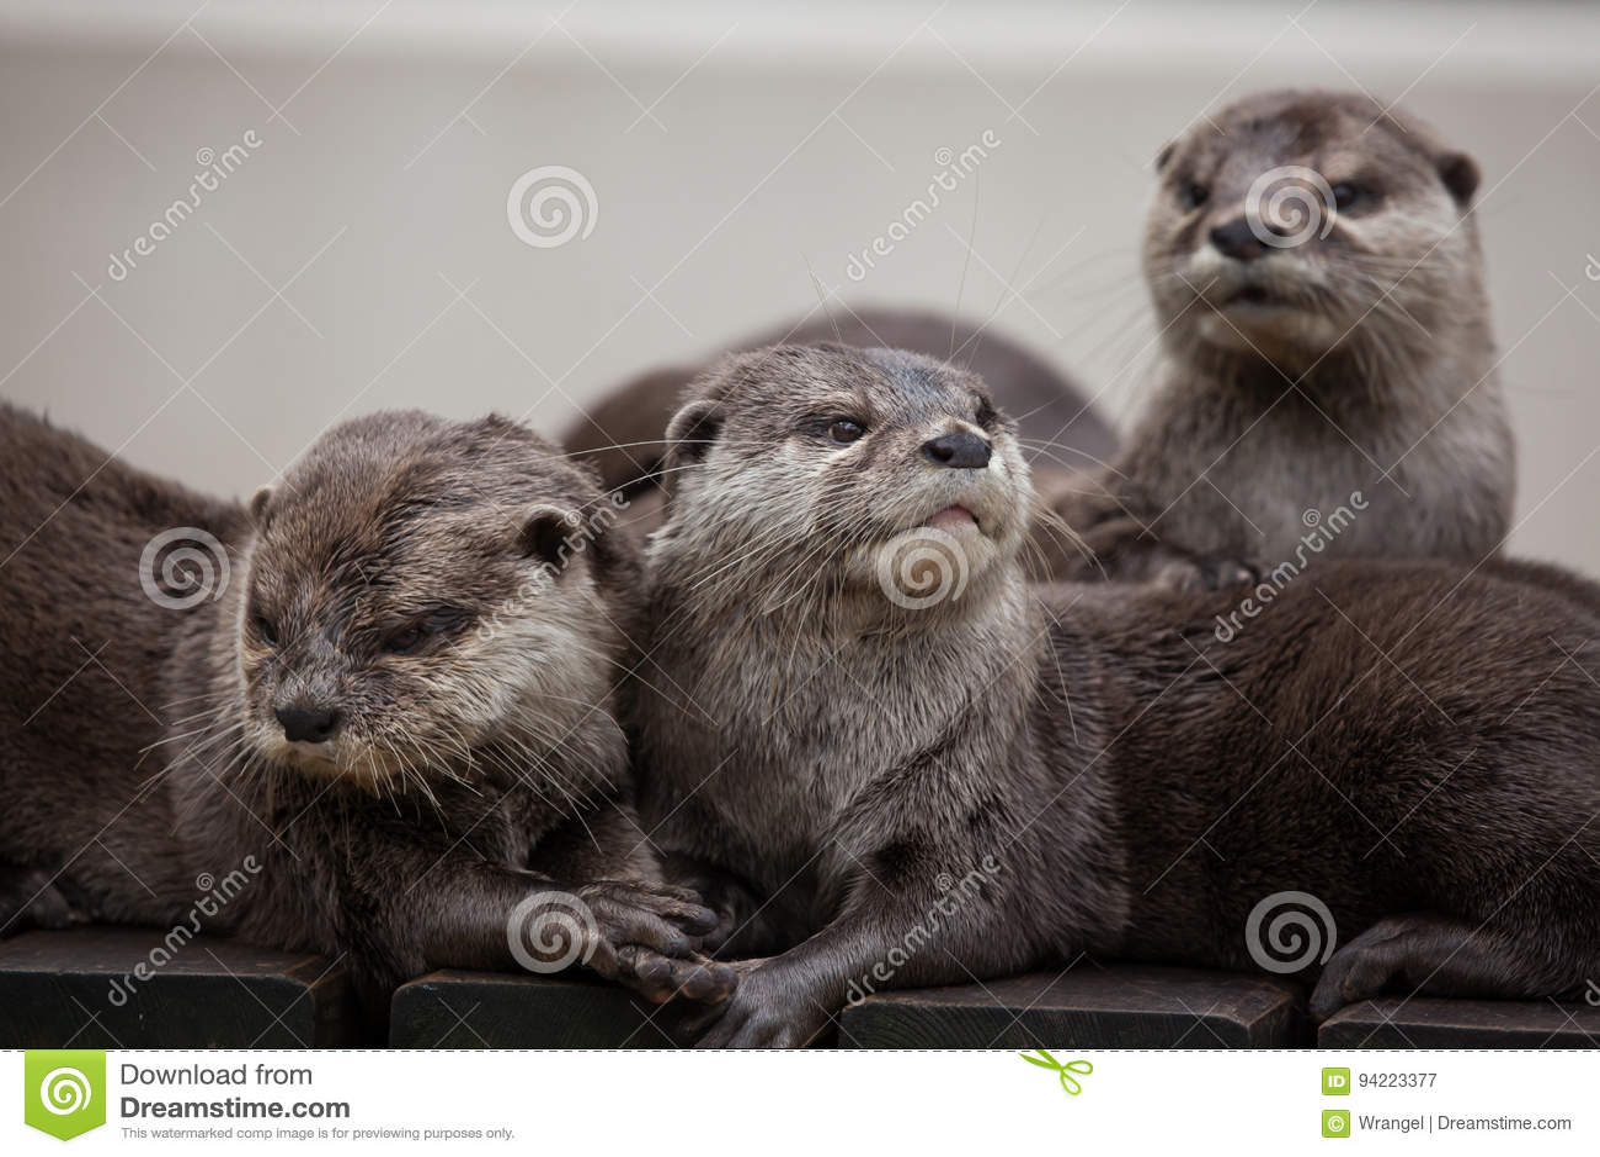 Oriental small-clawed otter Amblonyx cinereus